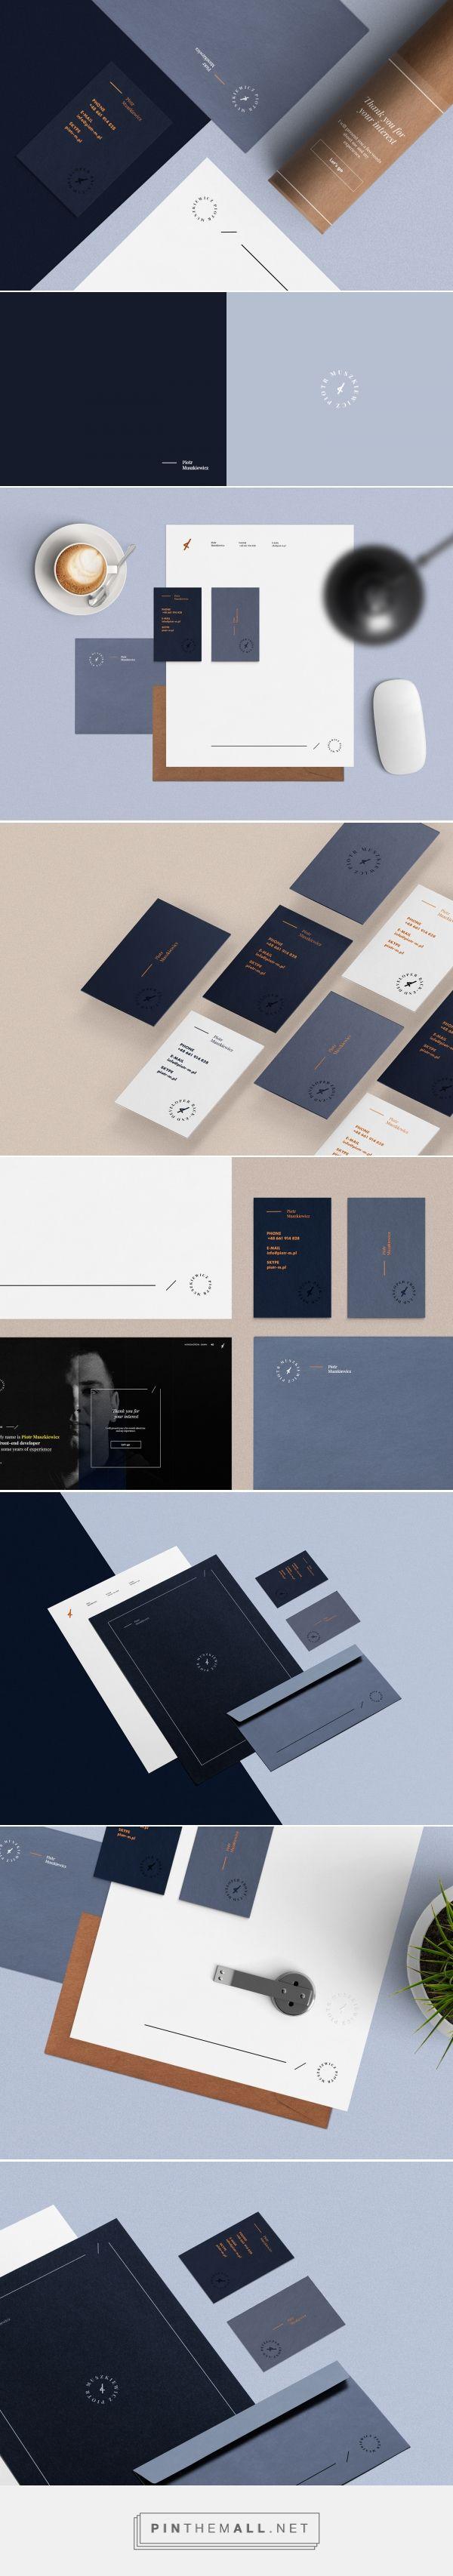 Piotr Muszkiewicz Developer Branding by Tomasz Mazurczak | Fivestar Branding Agency – Design and Branding Agency & Curated Inspiration Gallery